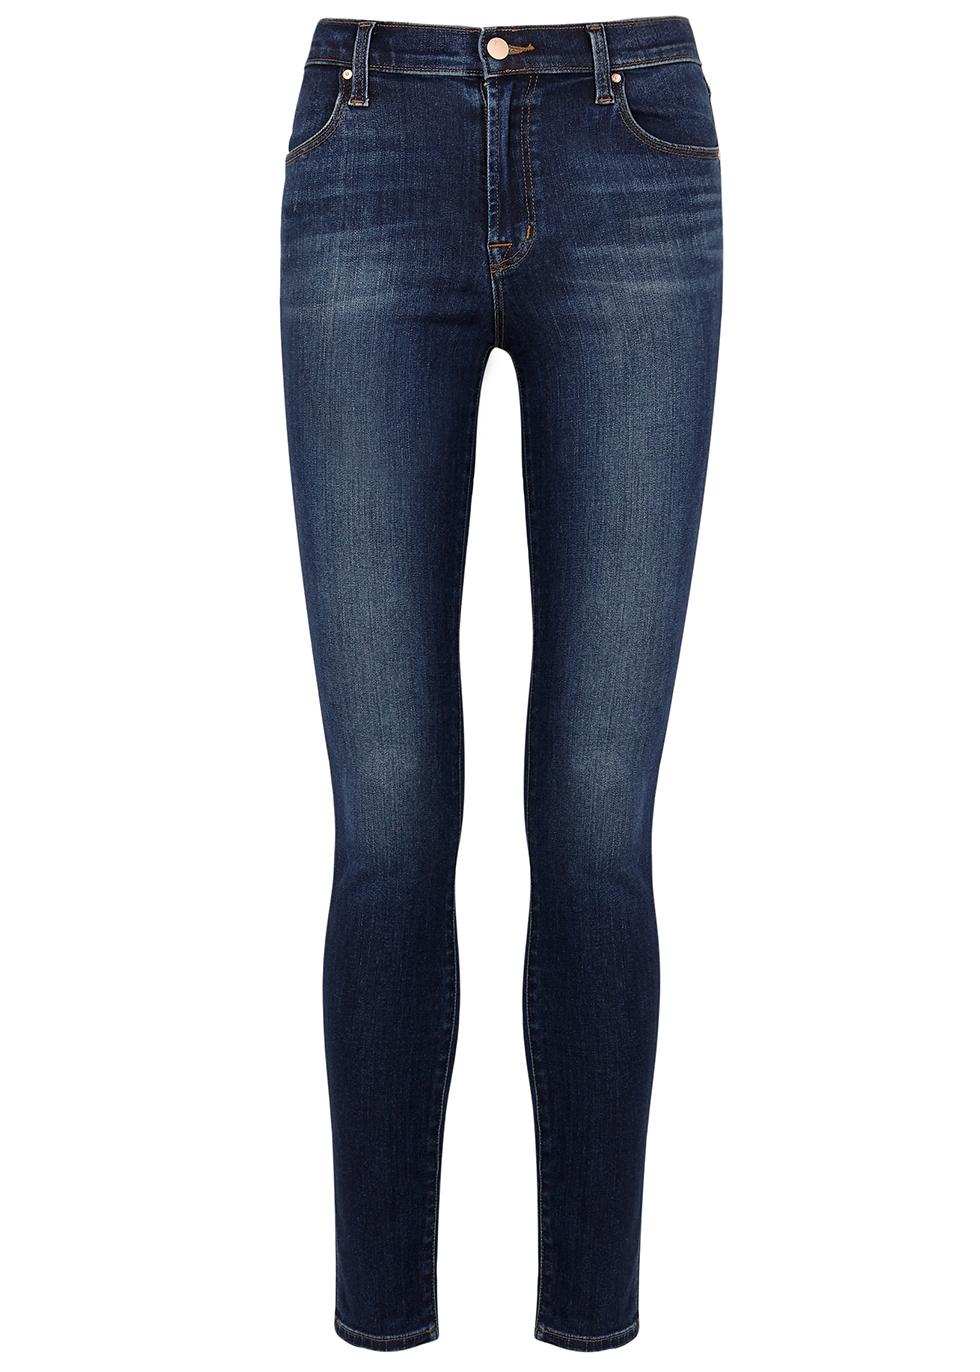 Maria blue denim jeans